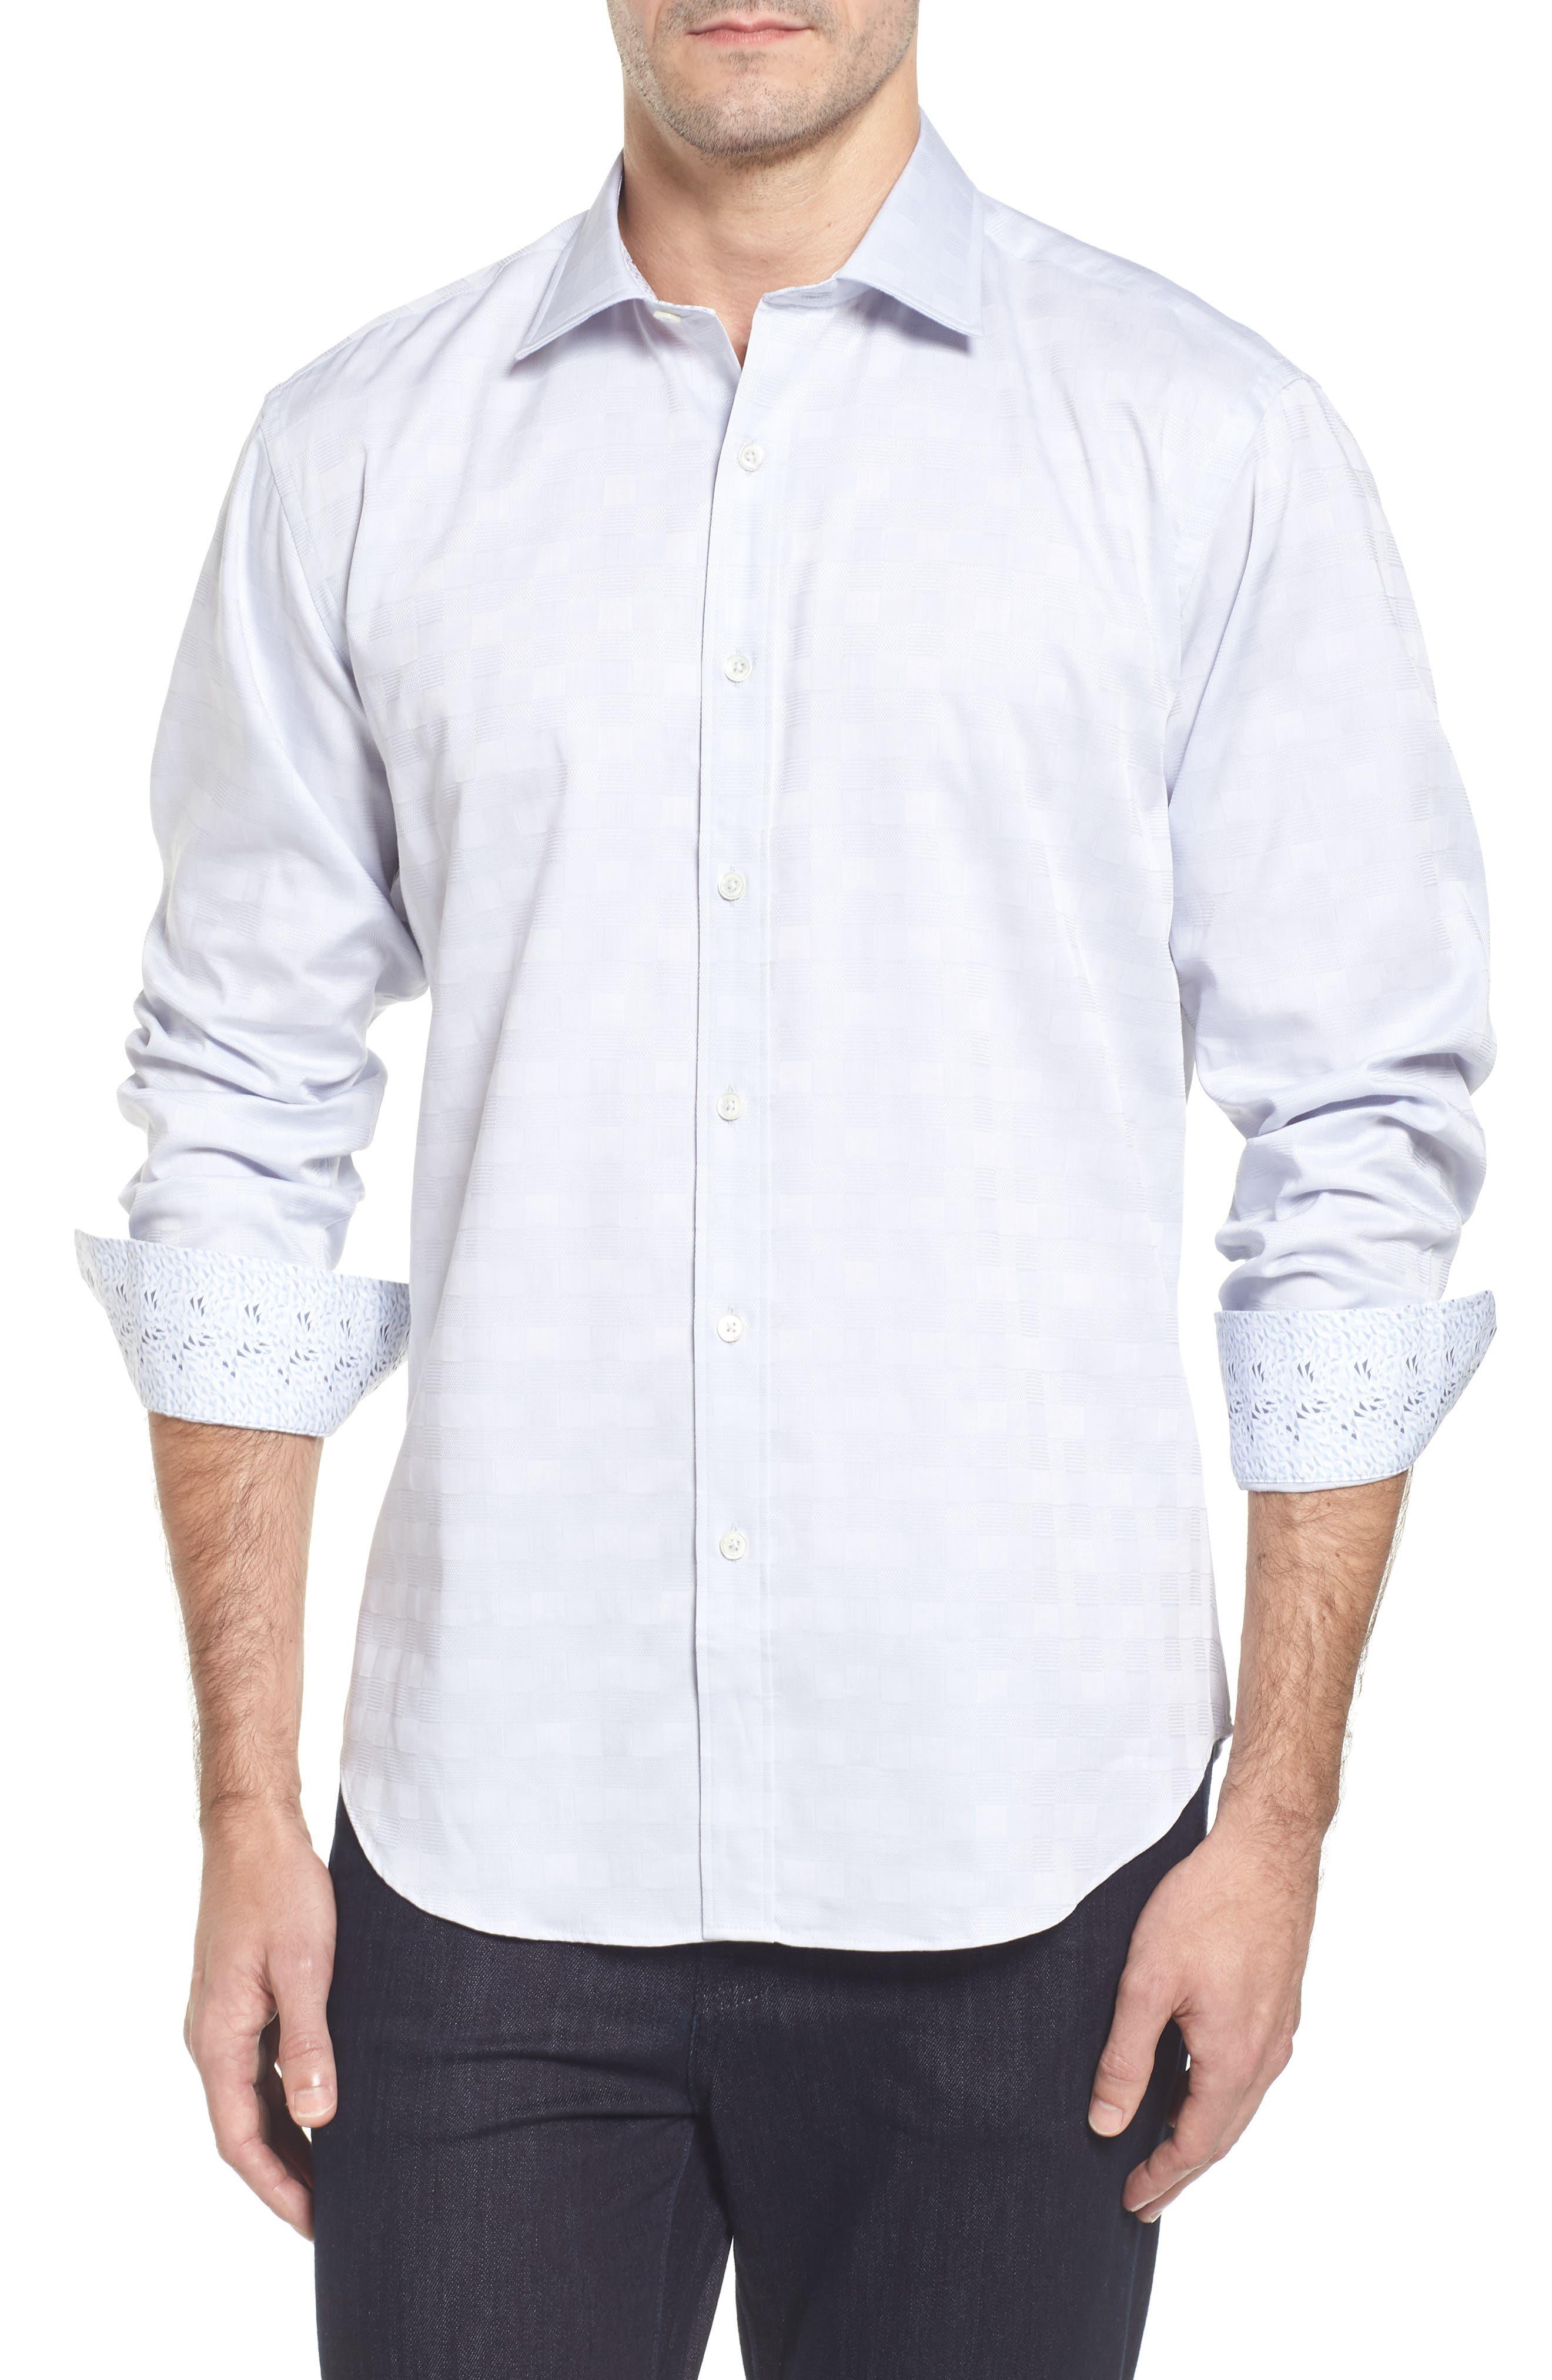 BUGATCHI Classic Fit Check Jacquard Sport Shirt, Main, color, 040